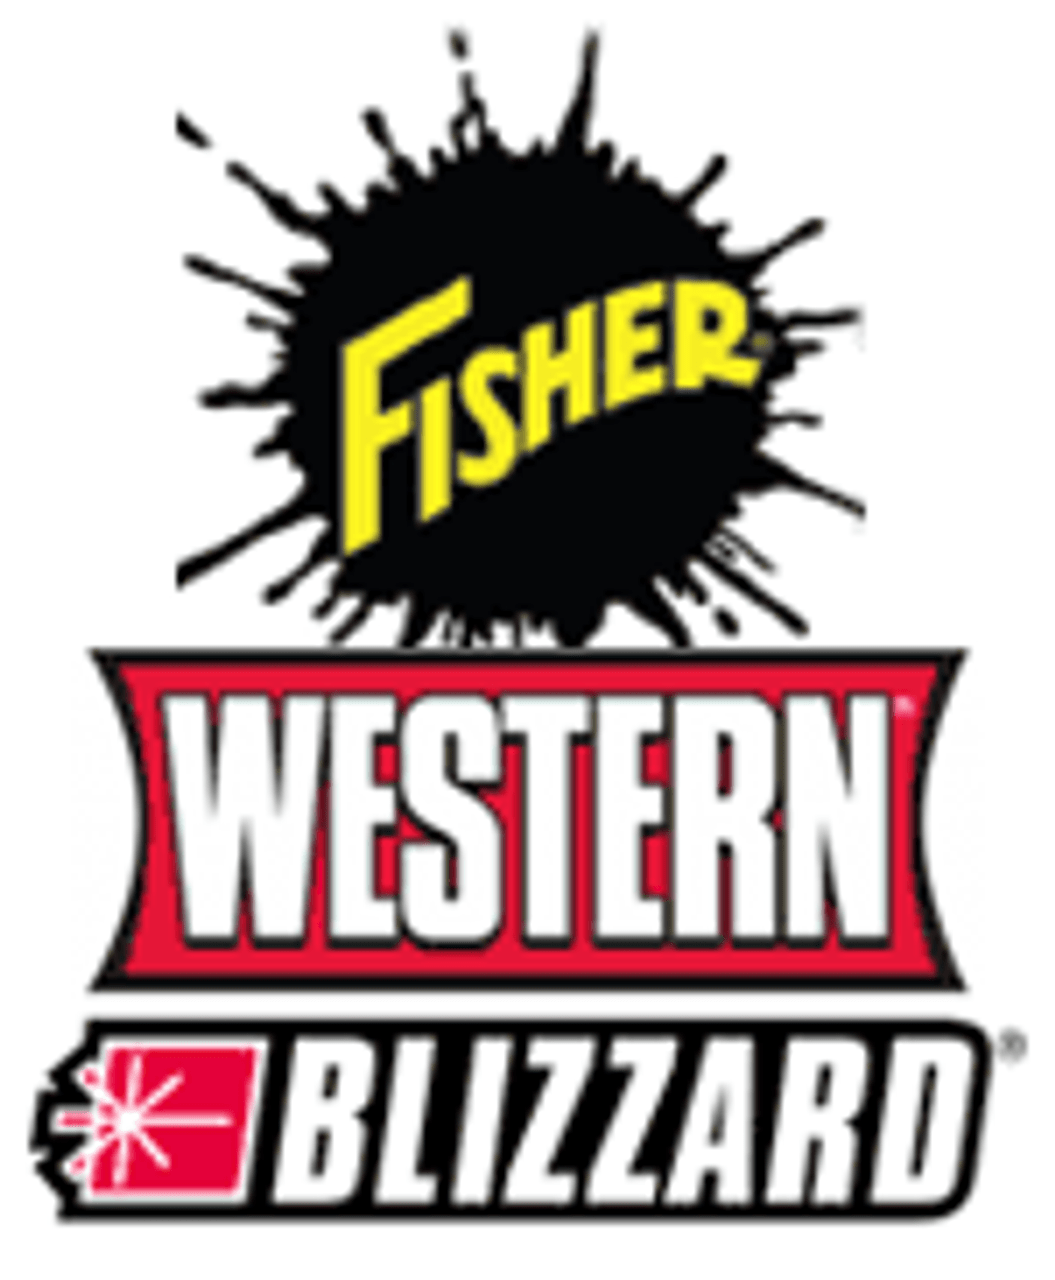 22314 - FISHER - WESTERN - BLIZZARD - SNOWEX  1/2-13X1-1/2 HX CS G5 W/HNDL